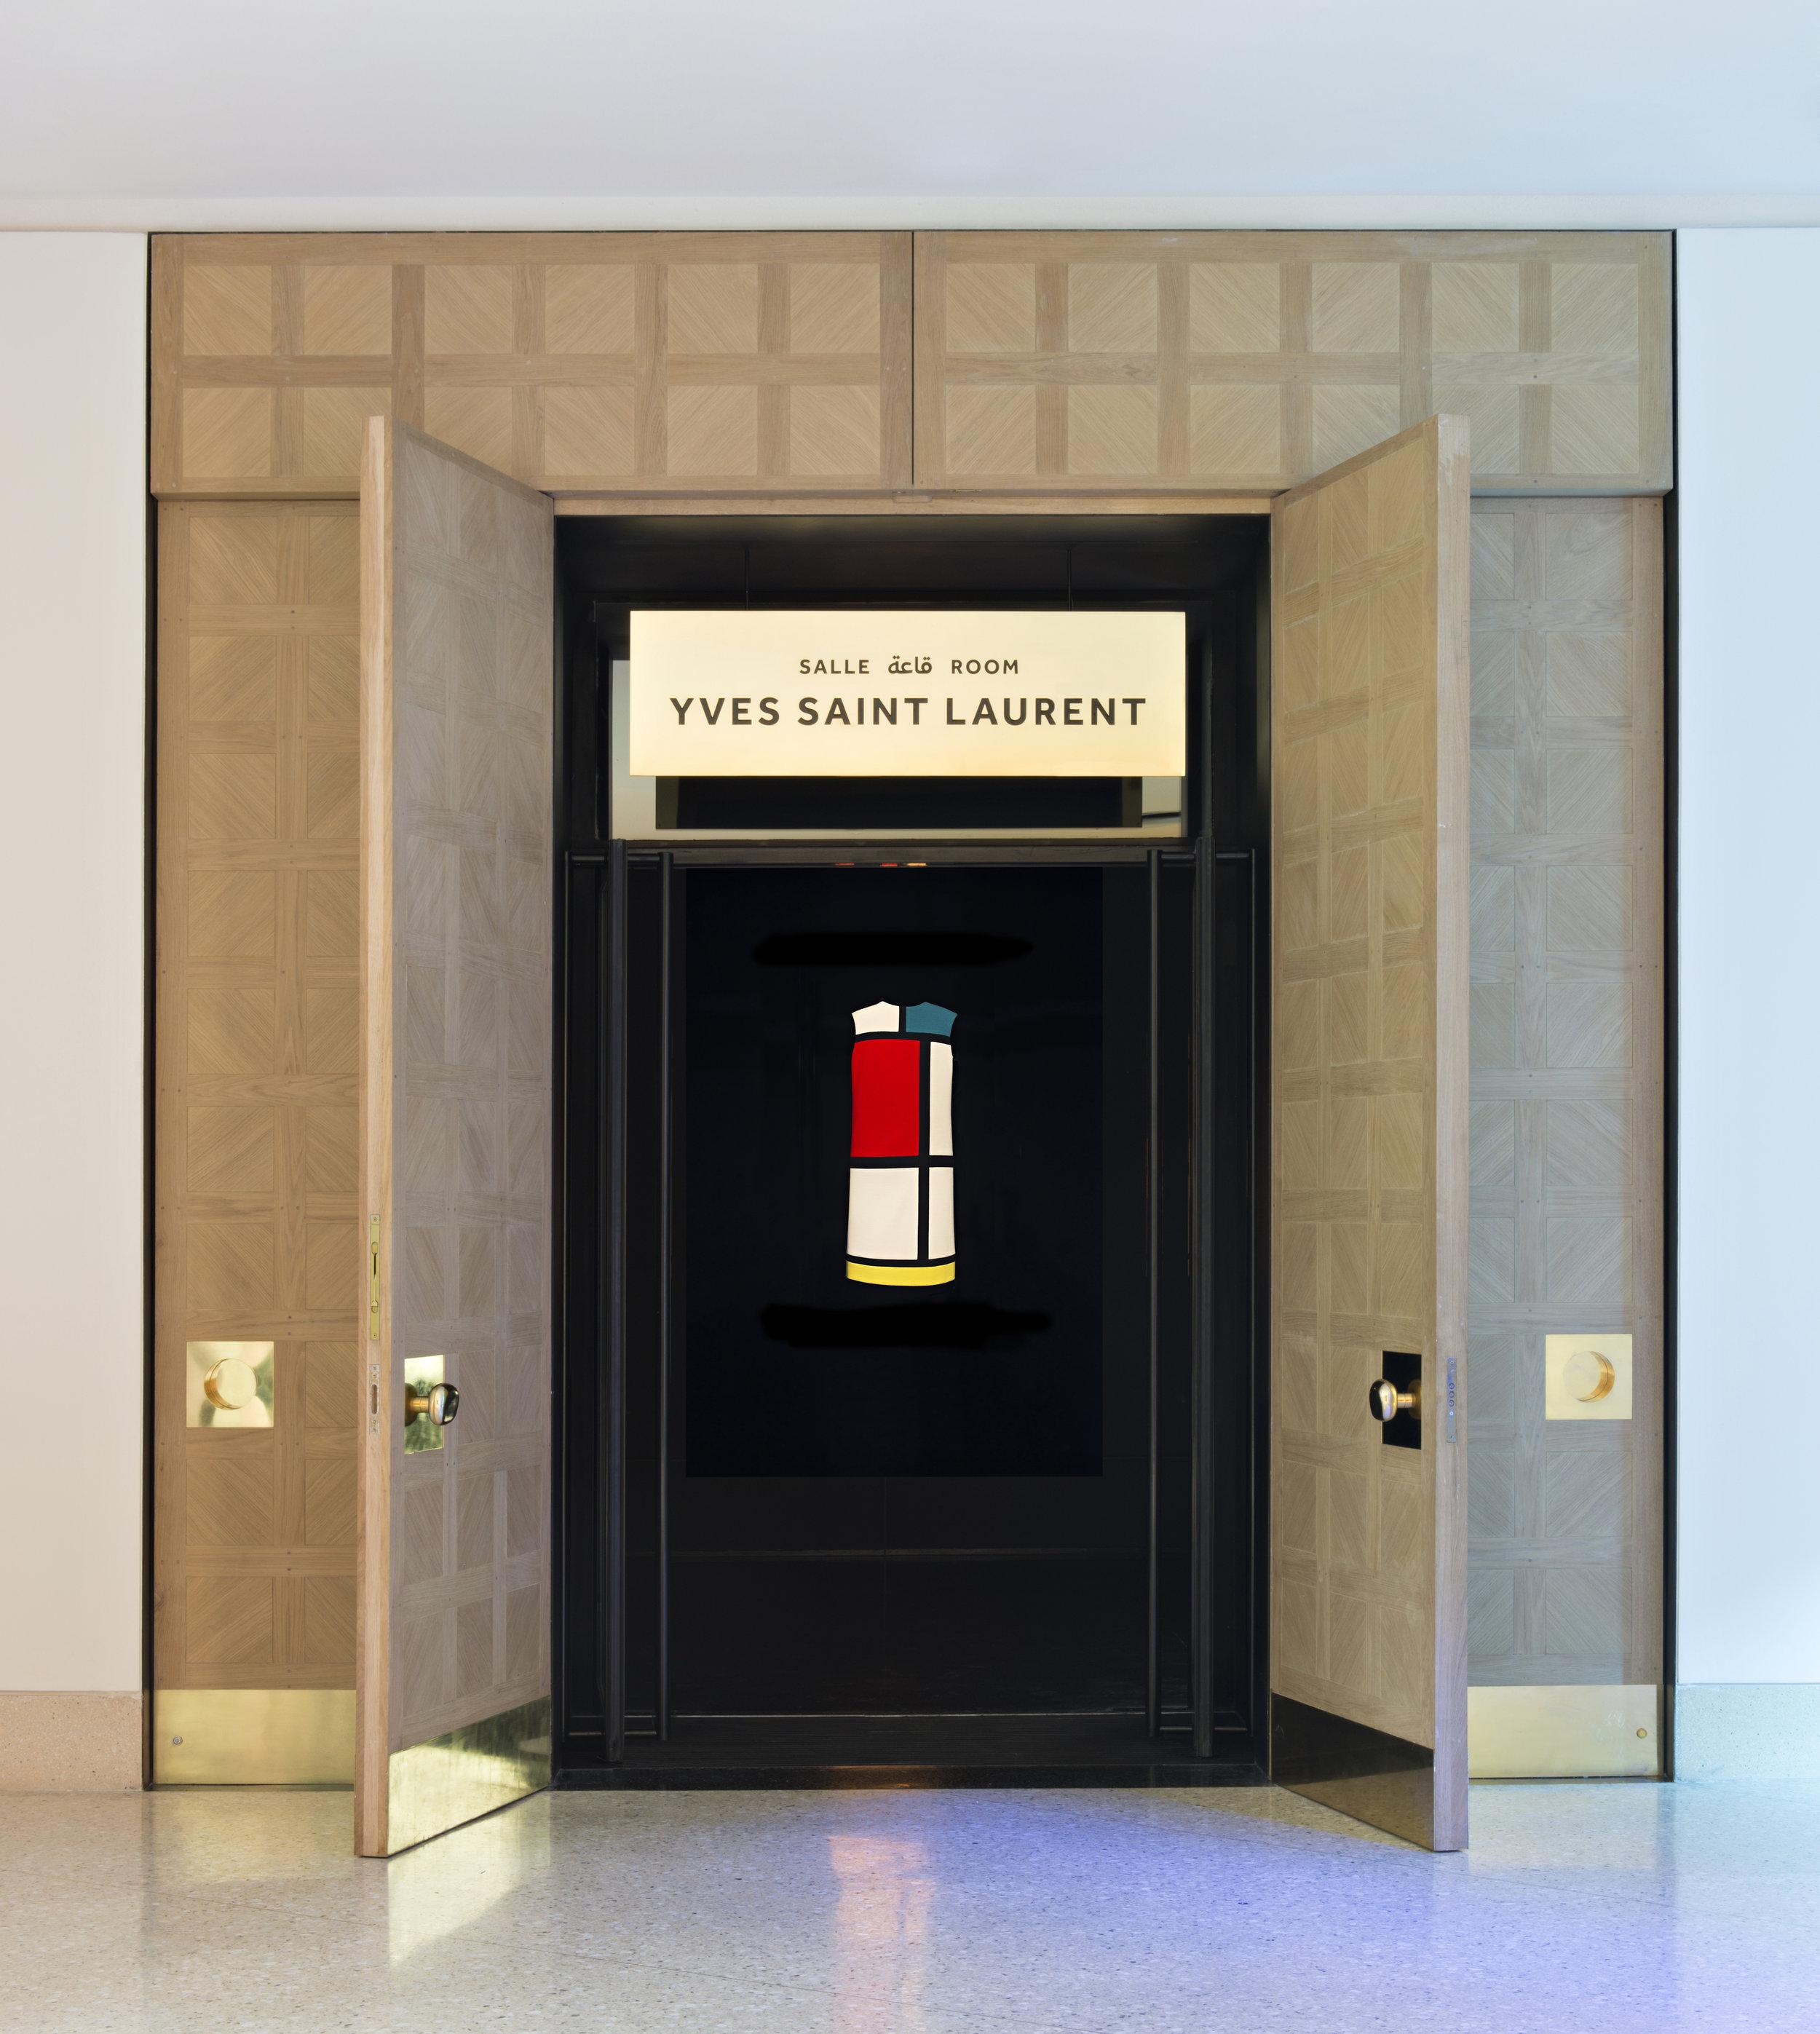 Entrance to la salle YSL, featuring the Mondrian dress Photo © Fondation Jardin Majorelle / Photo Nicolas Mathéus